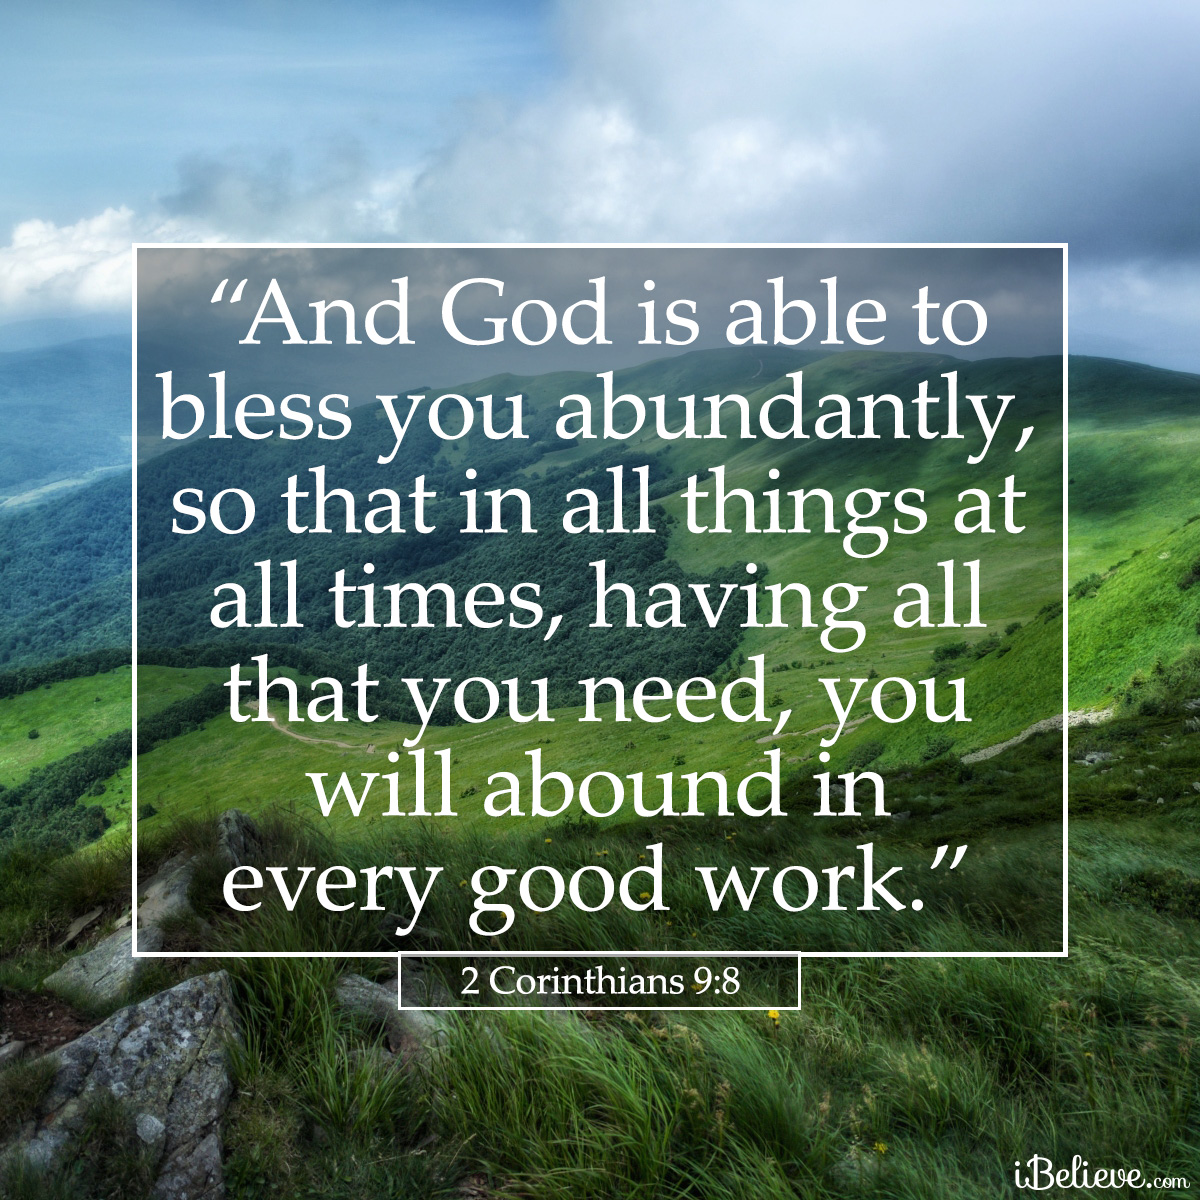 2 Corinthians 9:8, inspirational image